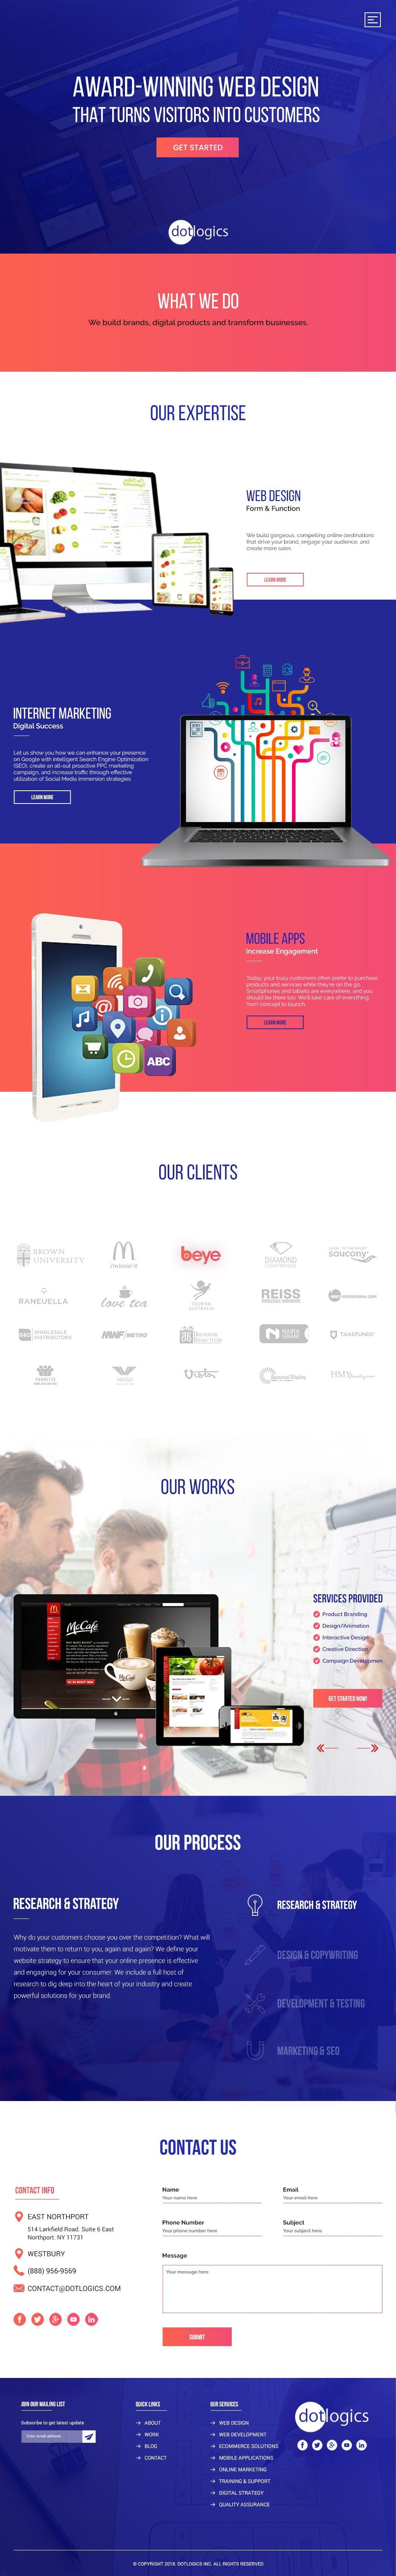 Designs New Website Needed For Web Design Marketing Company Web Page Design Contest Web Design Marketing Web Design Contest Design